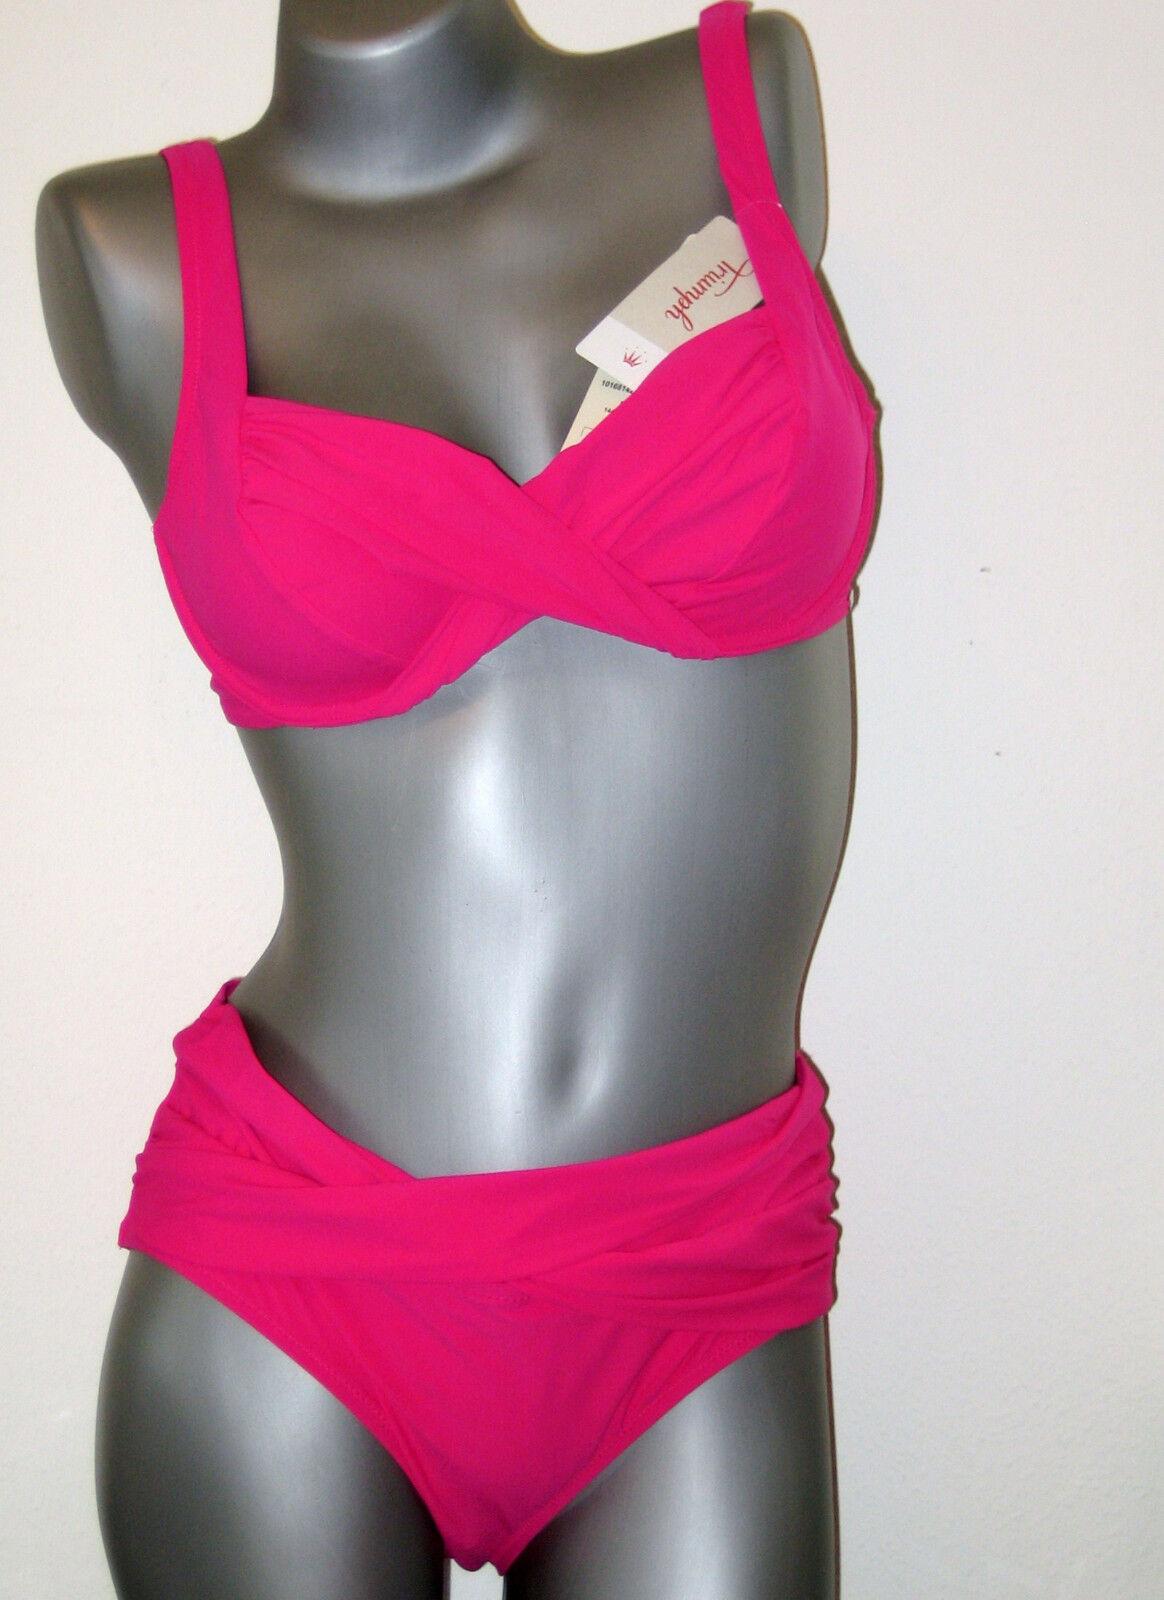 Ae Triumph Ensemble Bikini - 42 B - Coucher de Soleil Leaf W Neuf pink ( Go 38